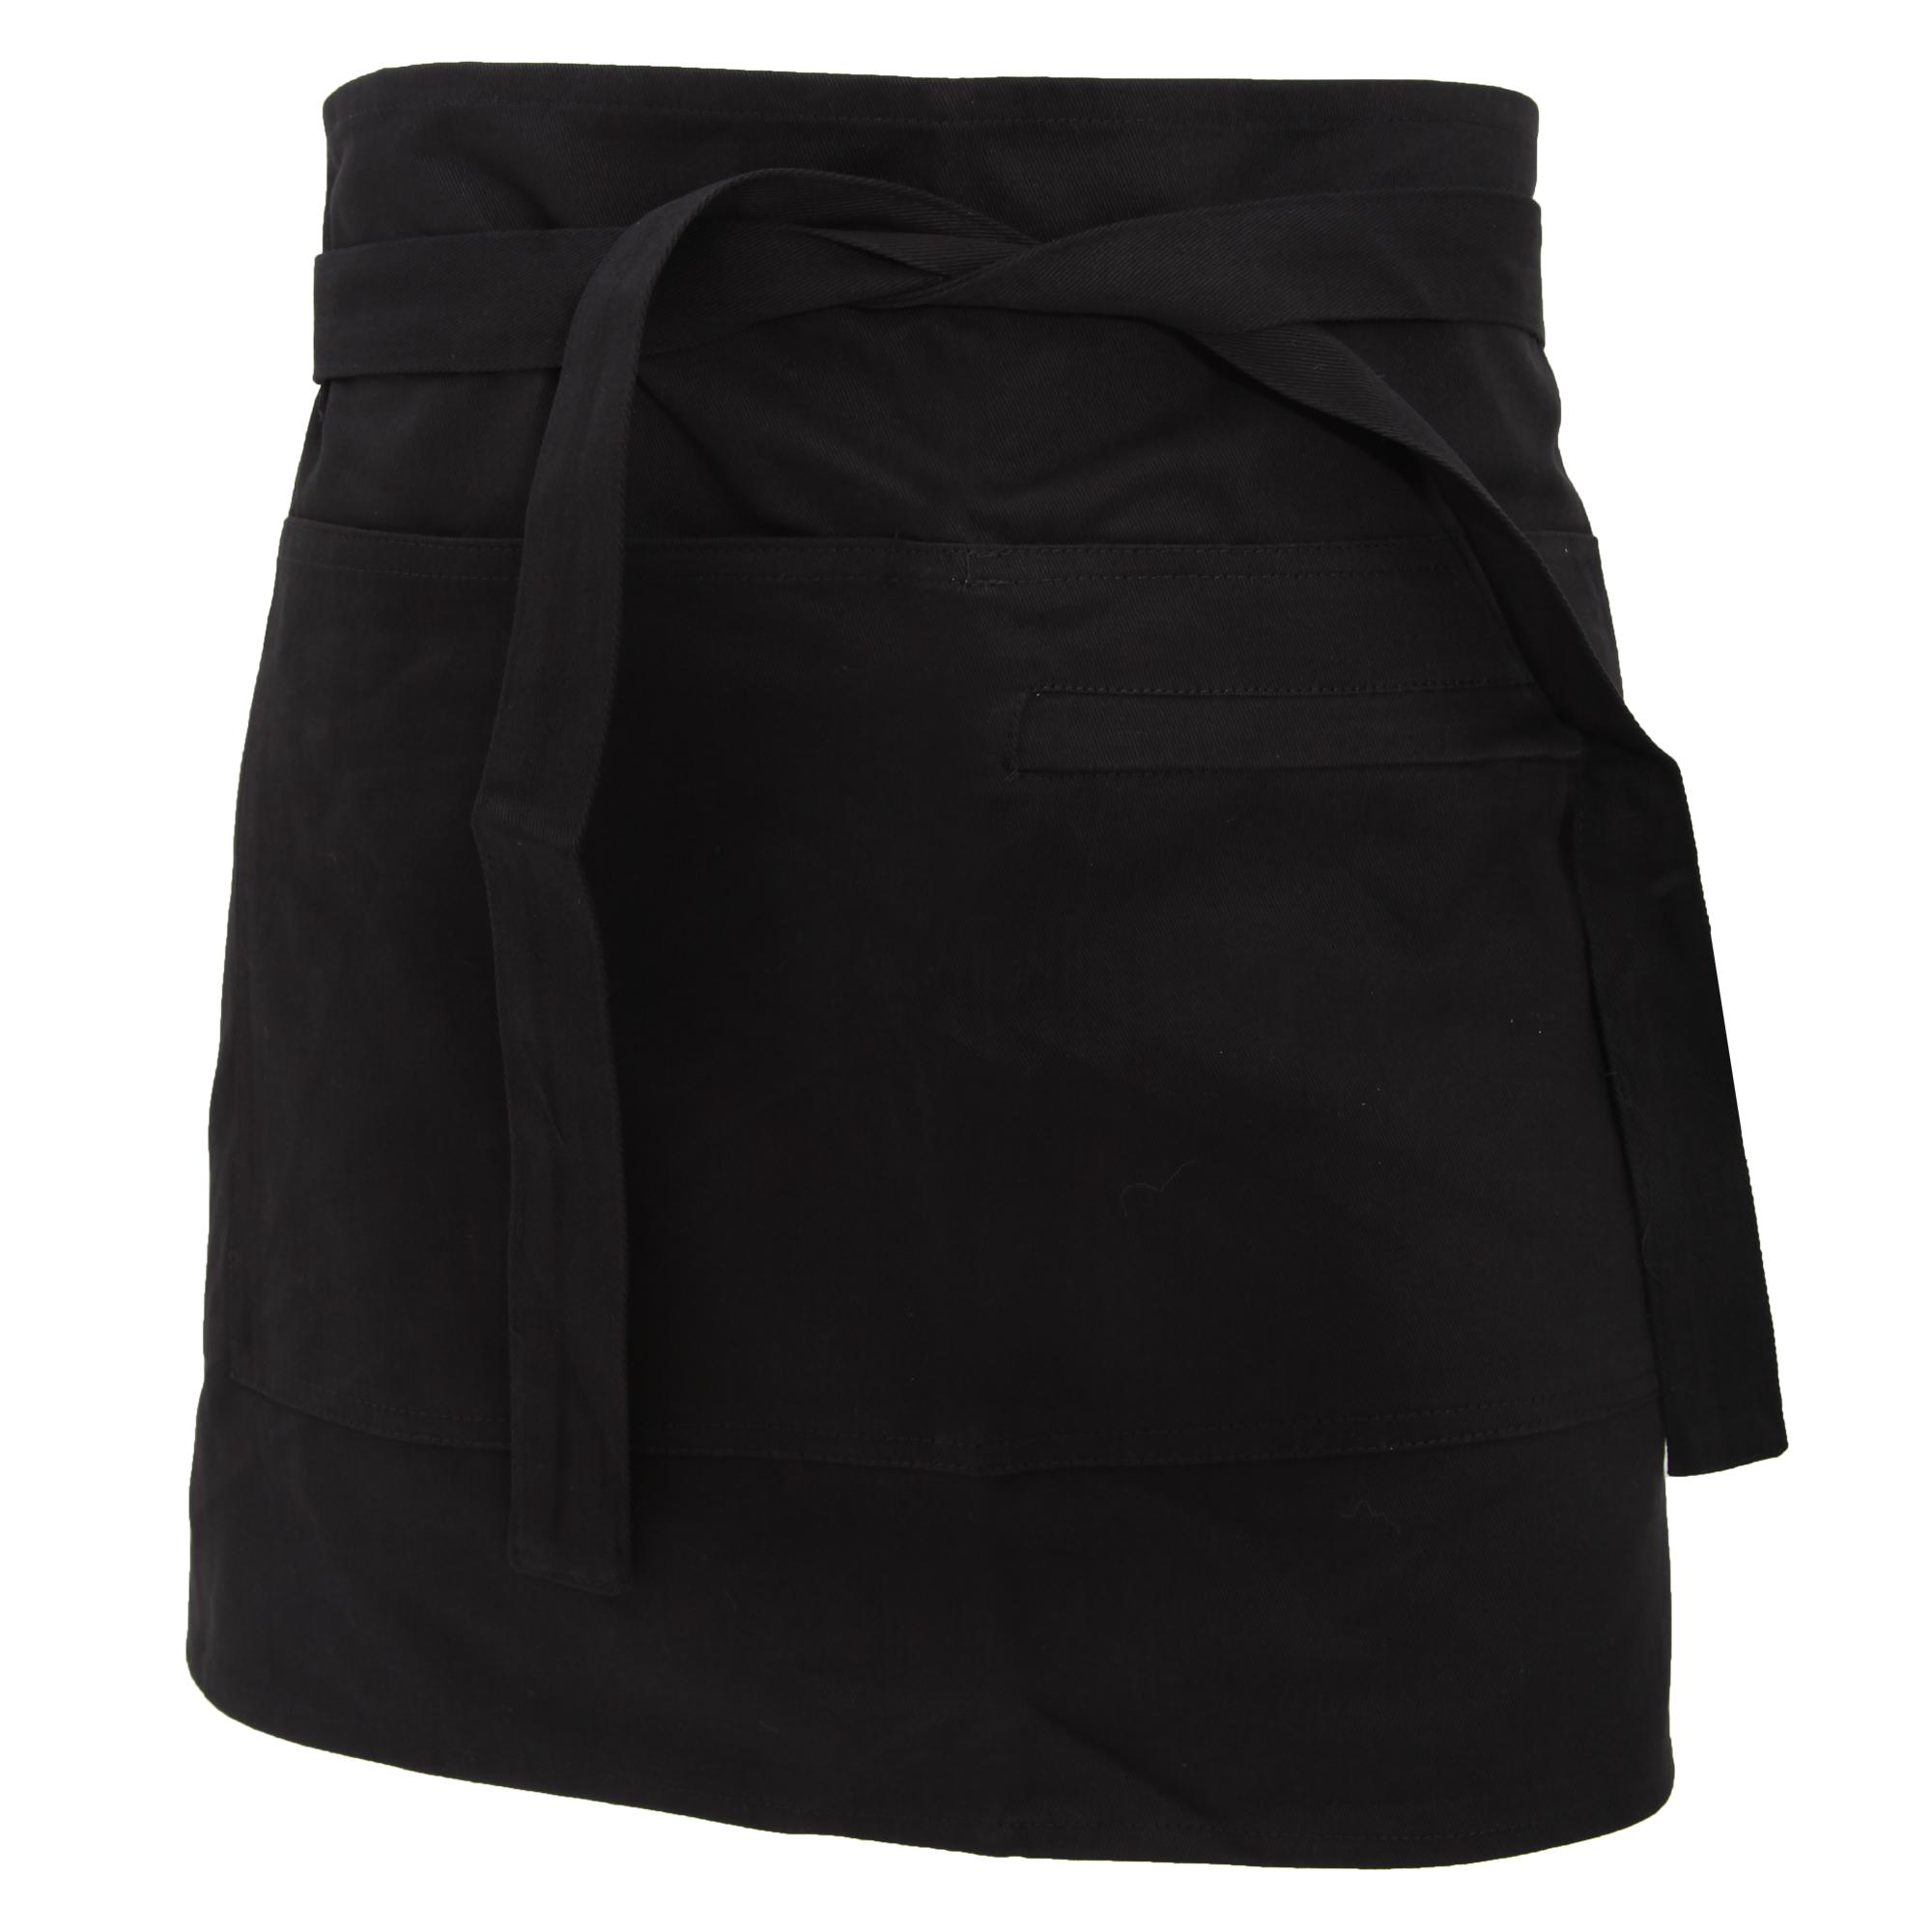 White tabard apron - Bargear Unisex Short Bar Apron Aprons And Tabards